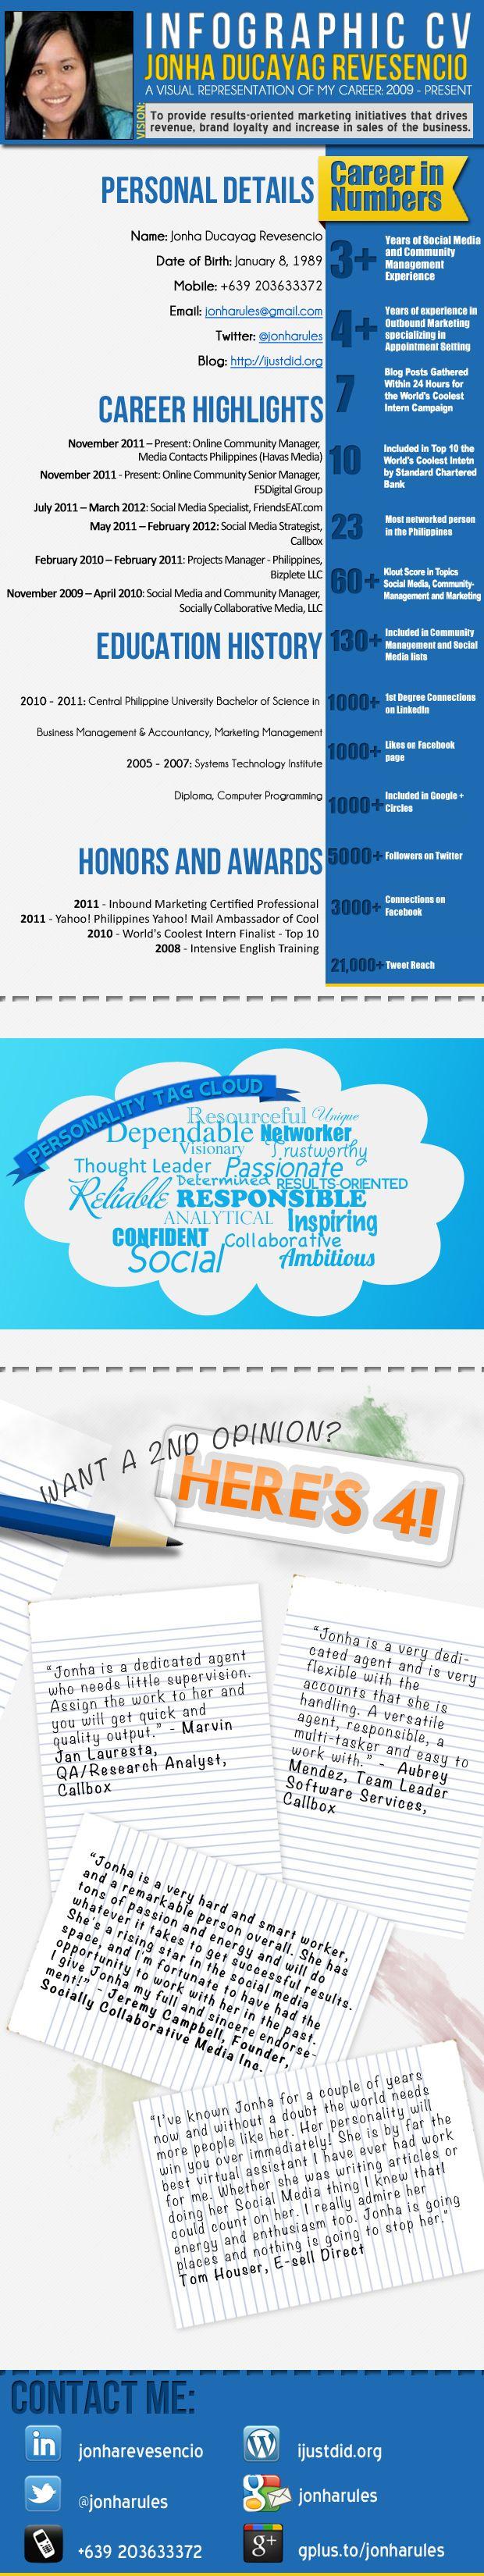 Infographic Resume - Update